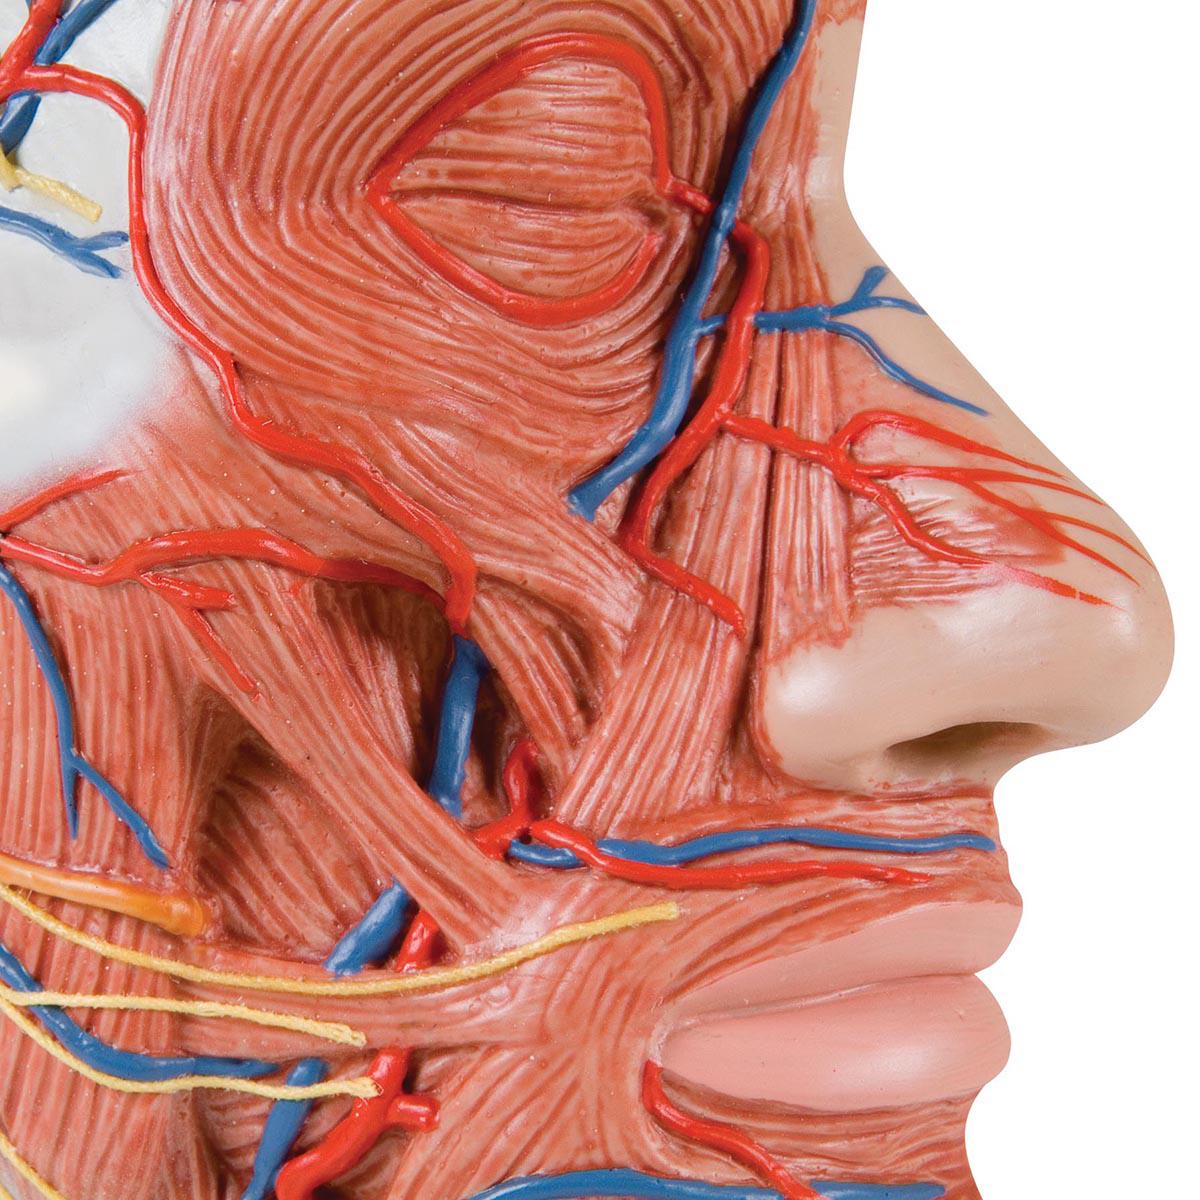 Anatomical Teaching Models Plastic Anatomy Models Half Head With